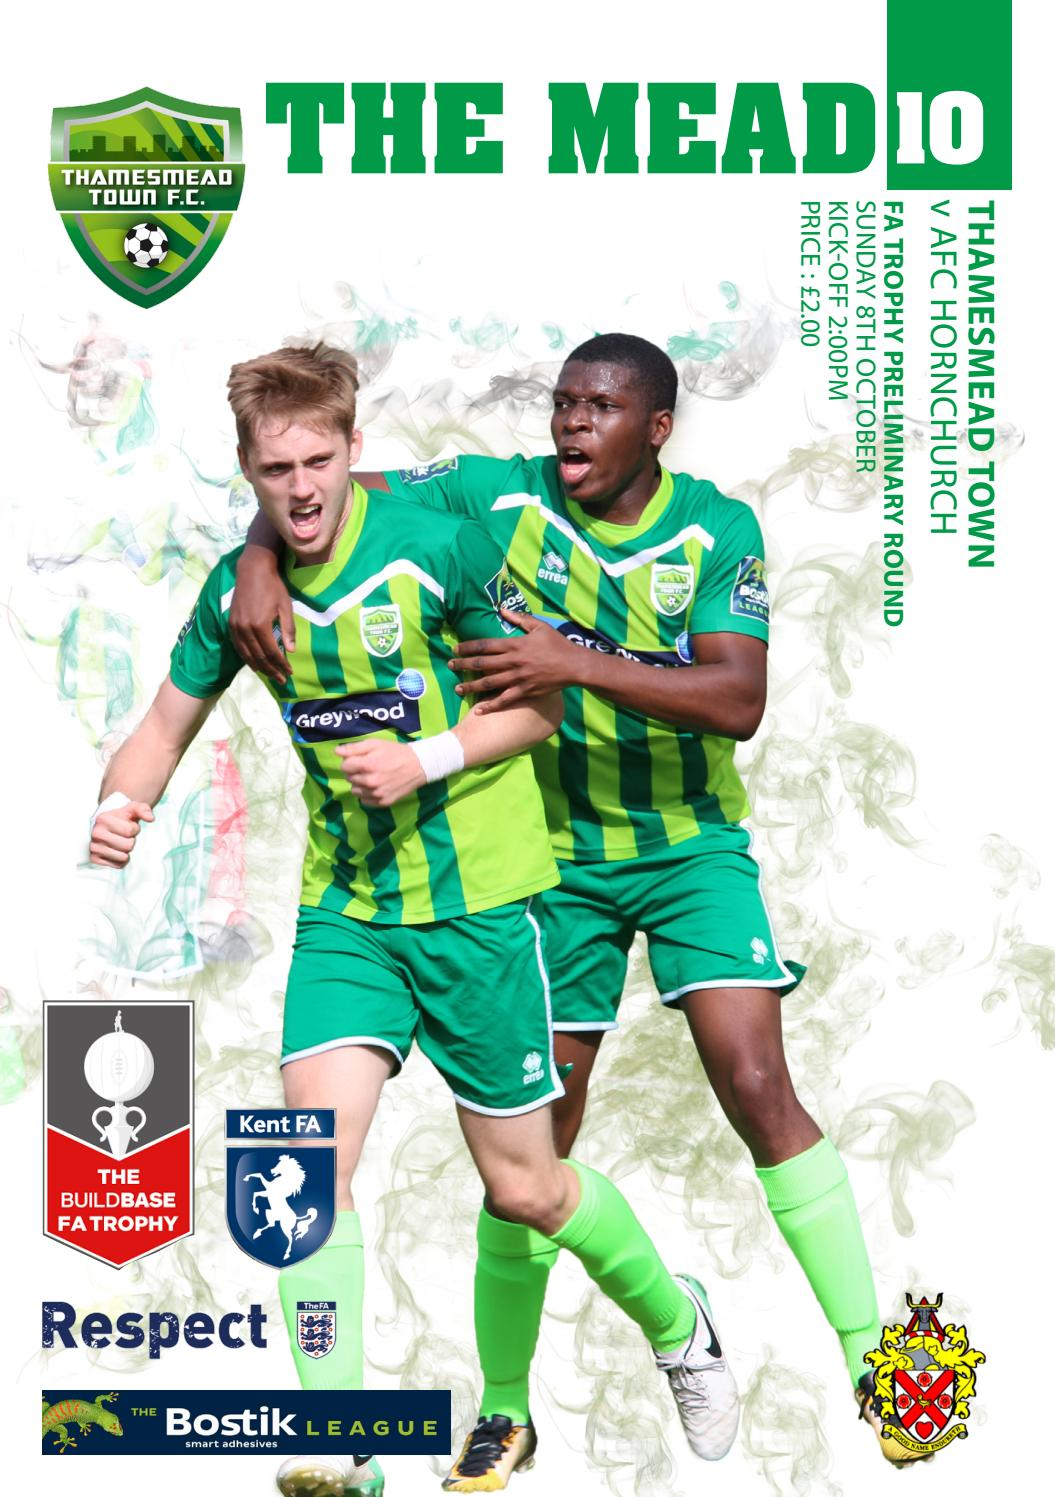 91c28f1d82 Thamesmead Town vs AFC Hornchurch by Jamie Barwick - issuu